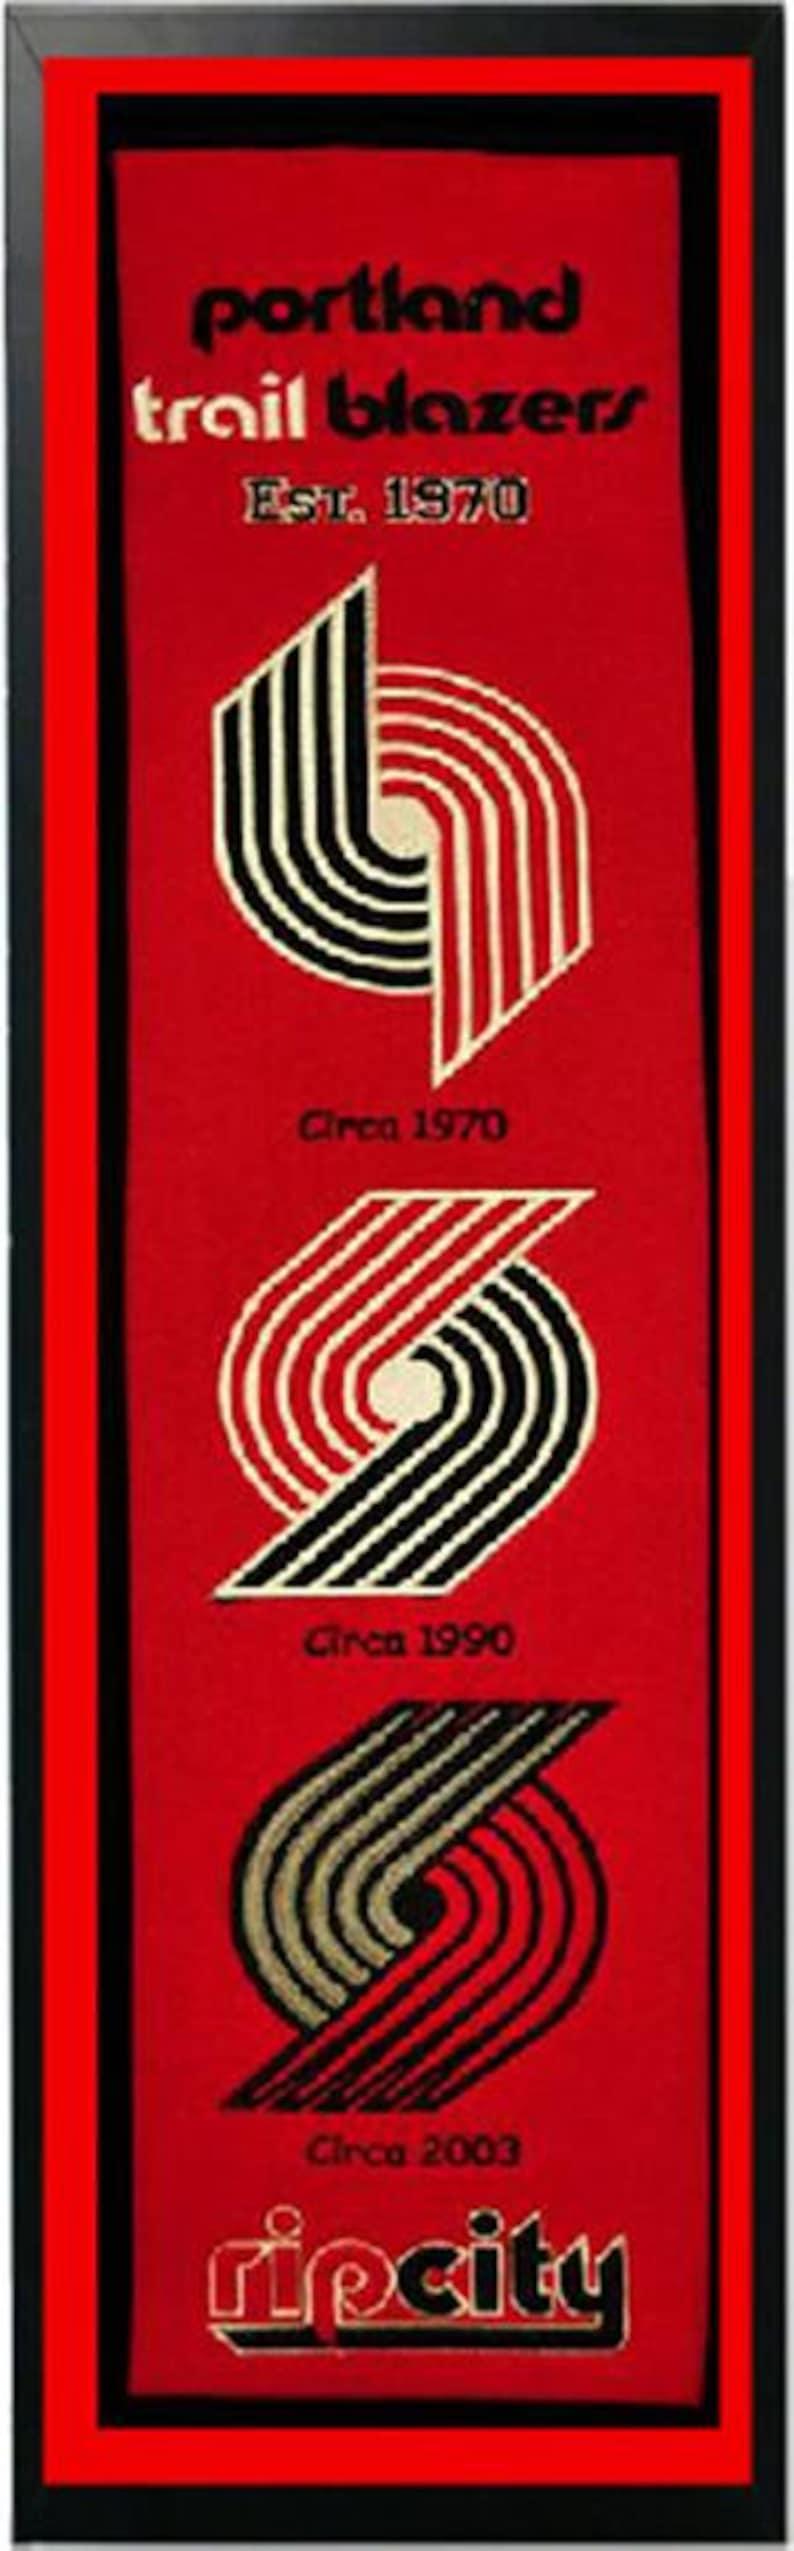 Portland Trail Blazers Logo History Felt Banner 14 x 37